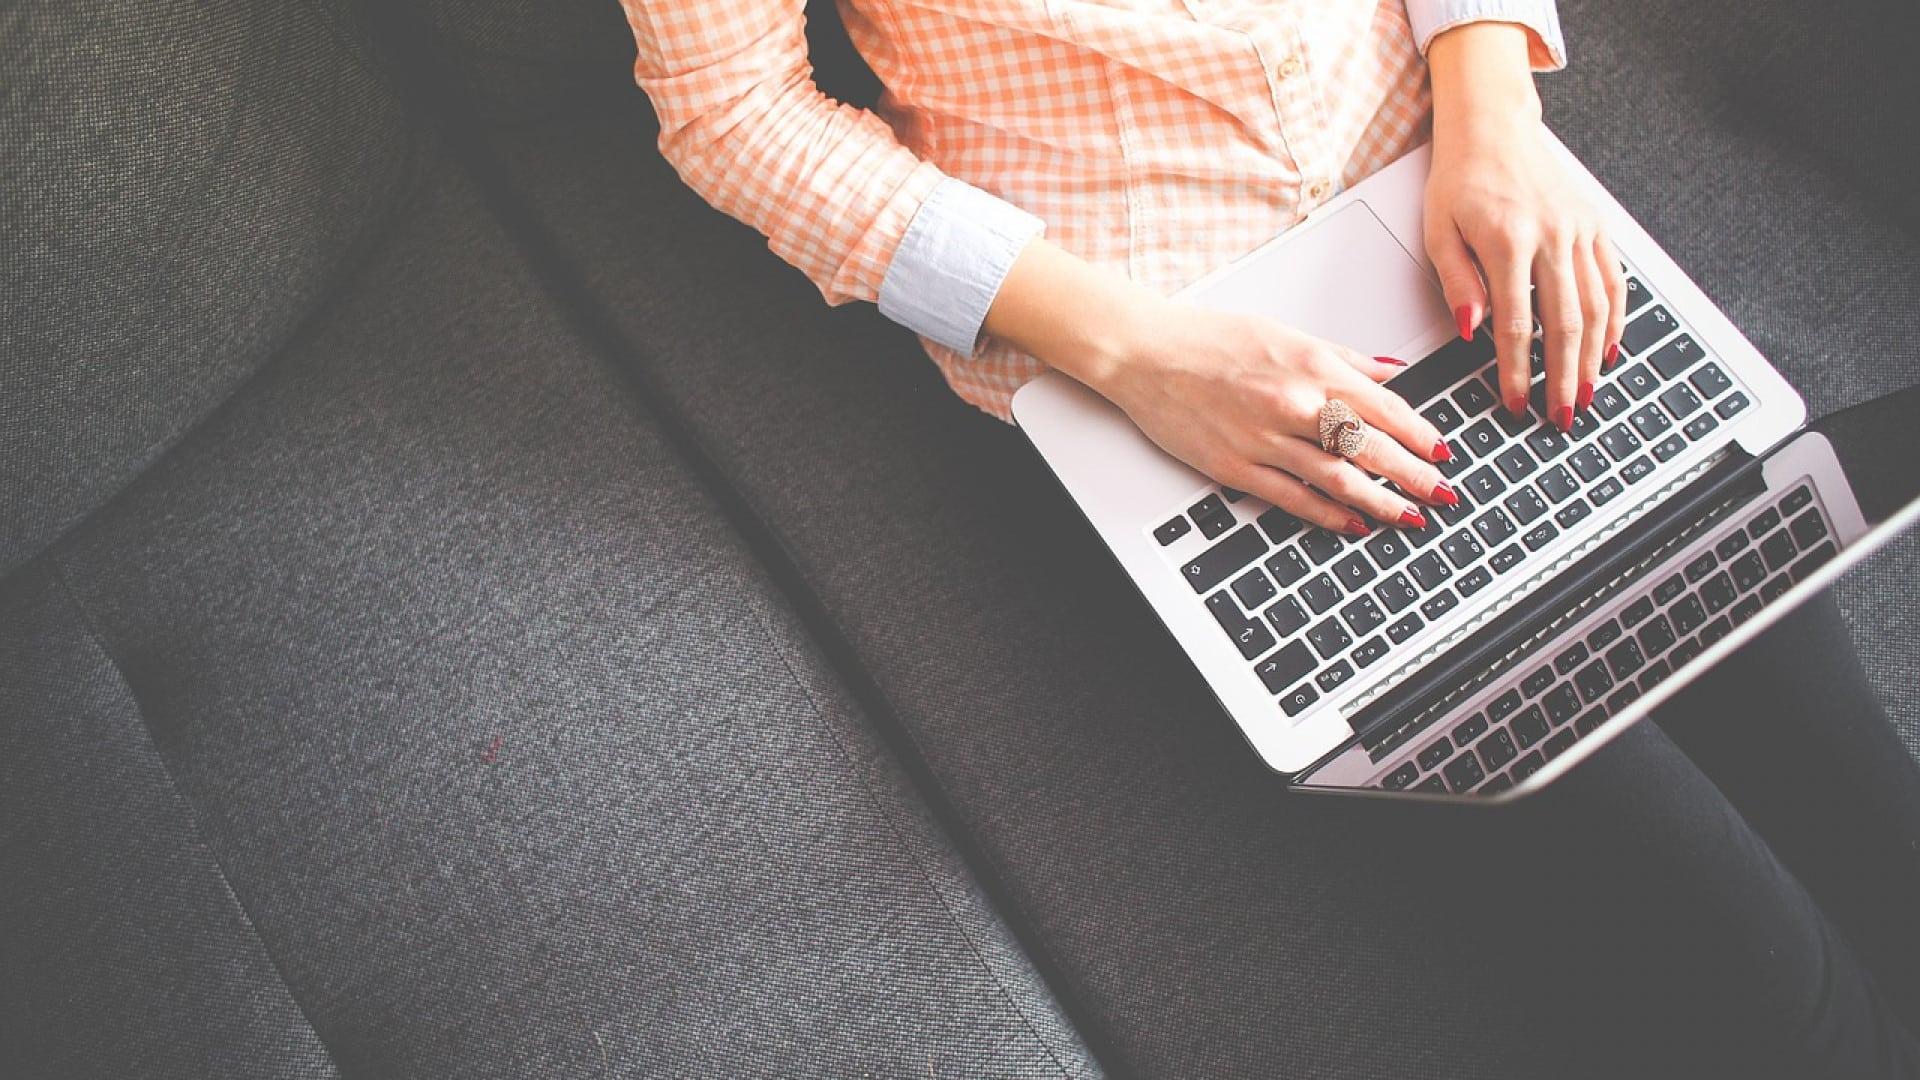 Pourquoi consulter un blog féminin ?